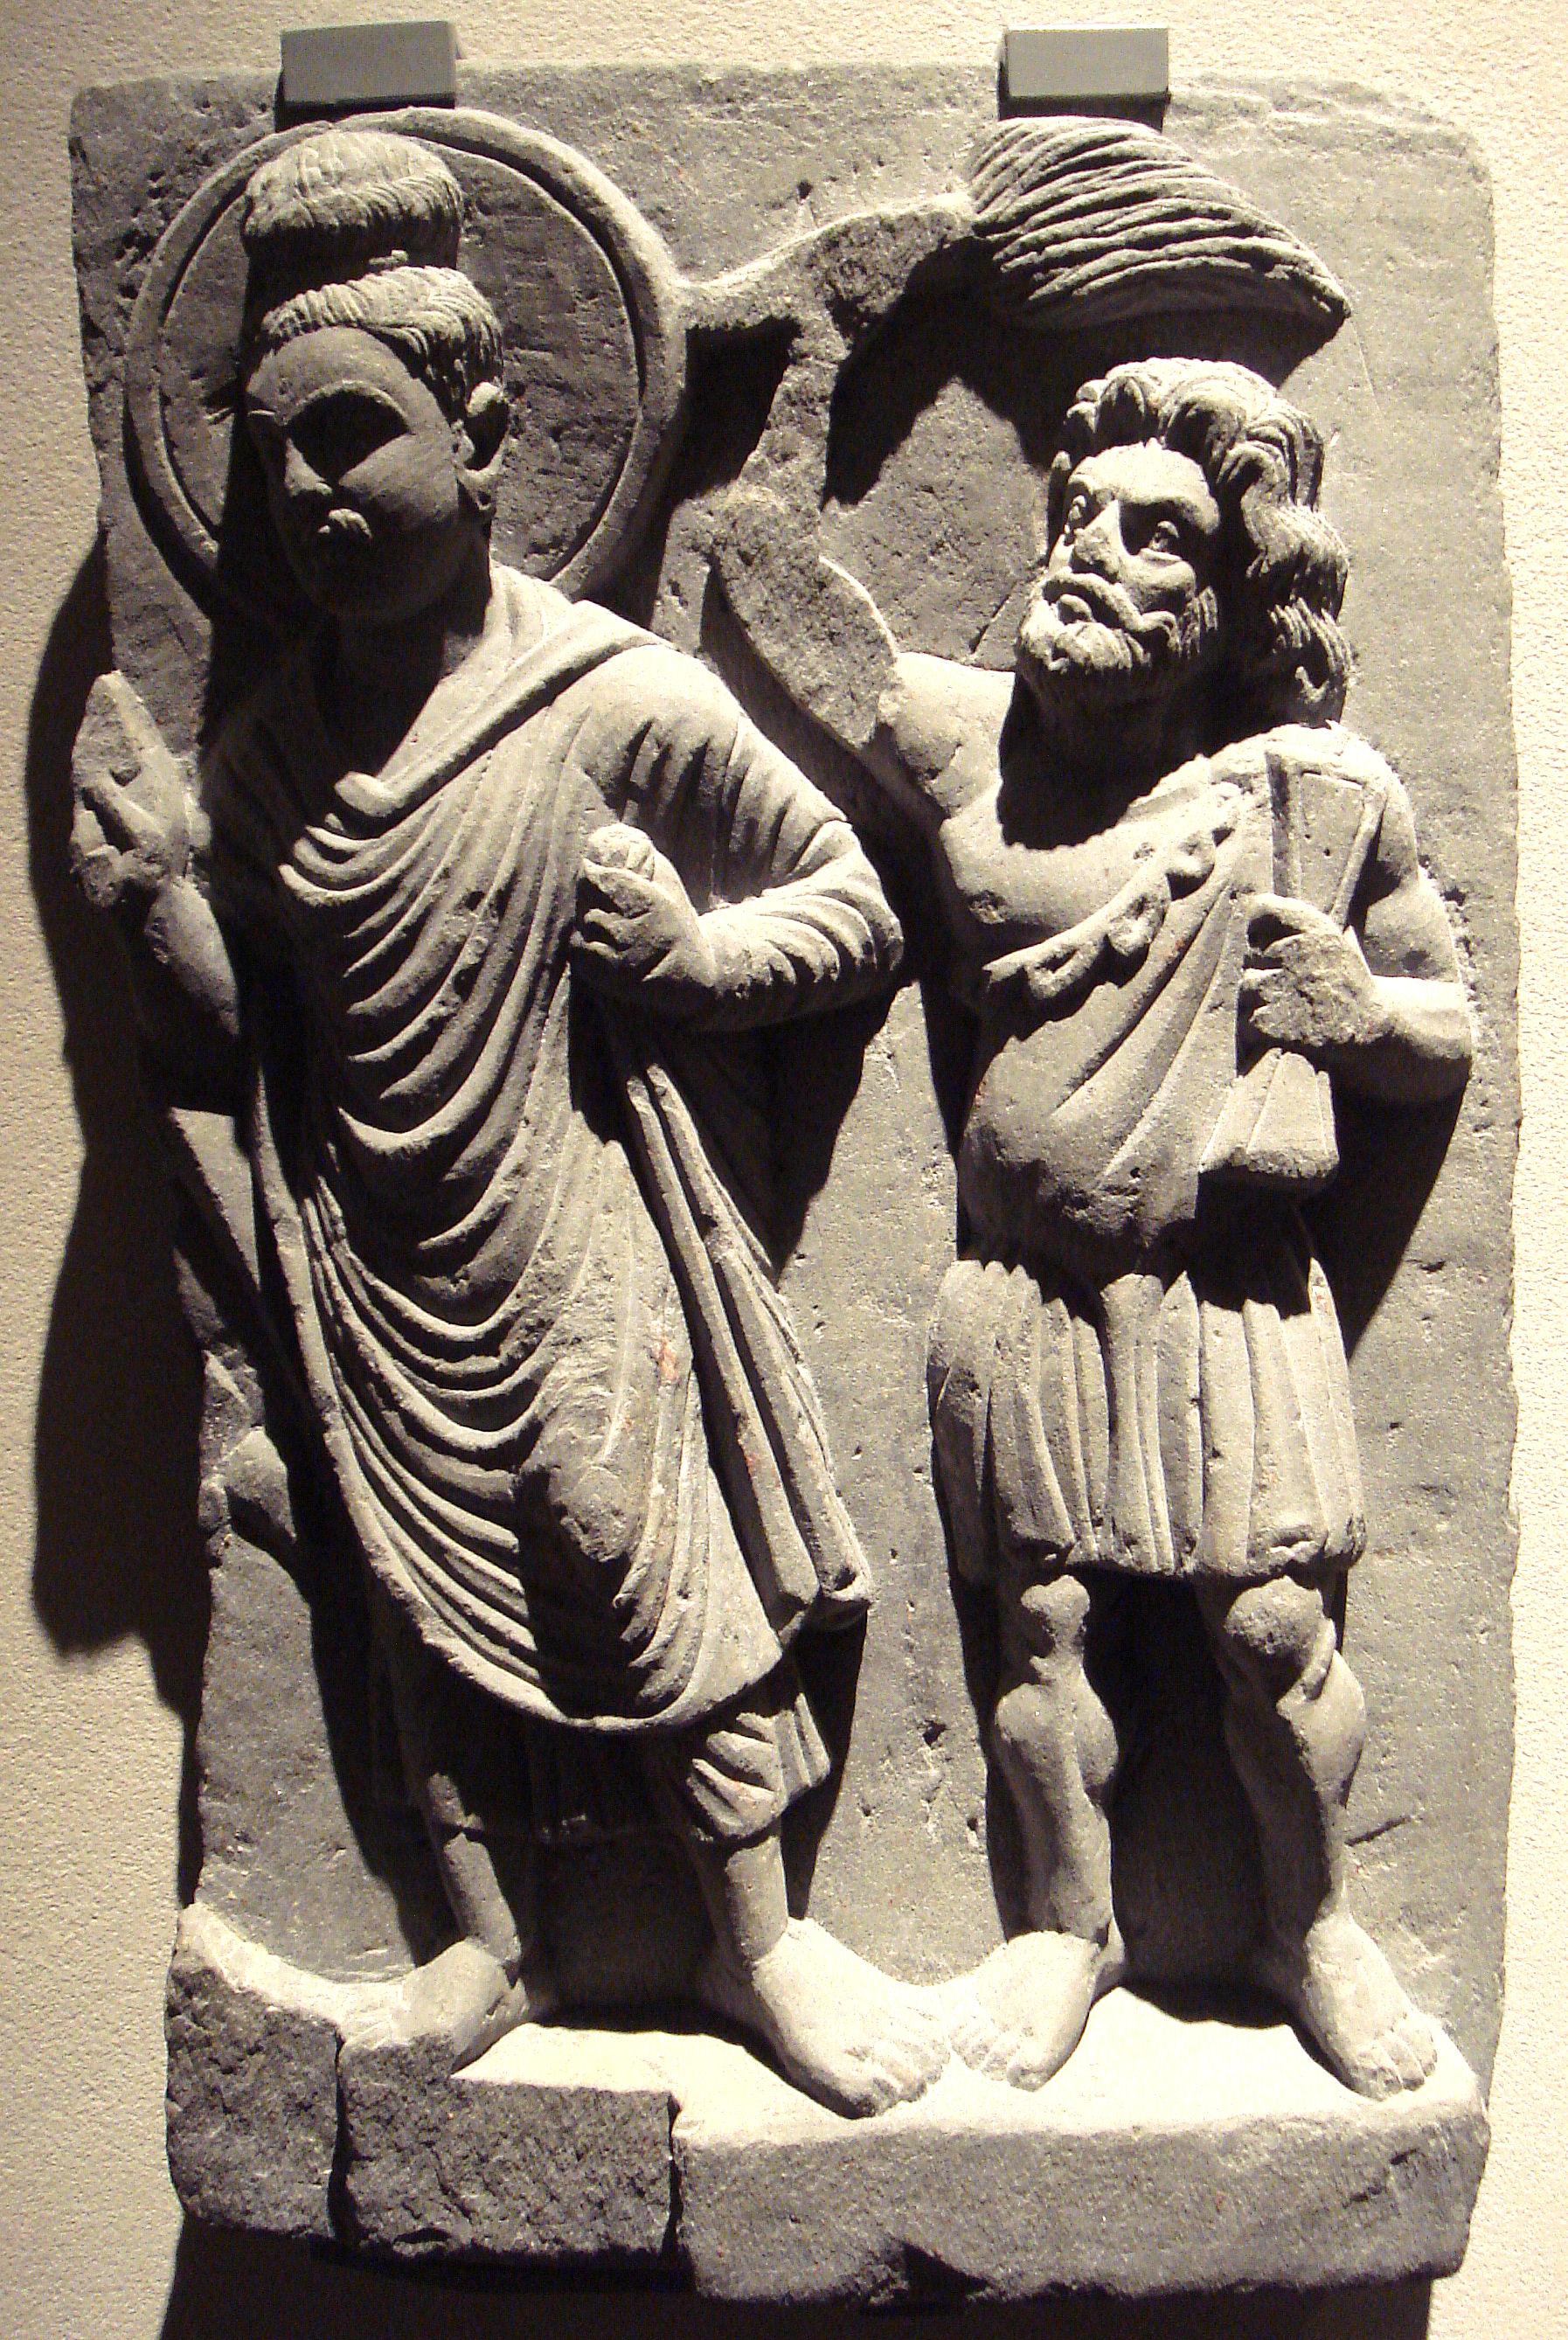 Buddha with his protector Vajrapani, Gandh ra, 2nd century CE, Ostasiatische Kunst Museum